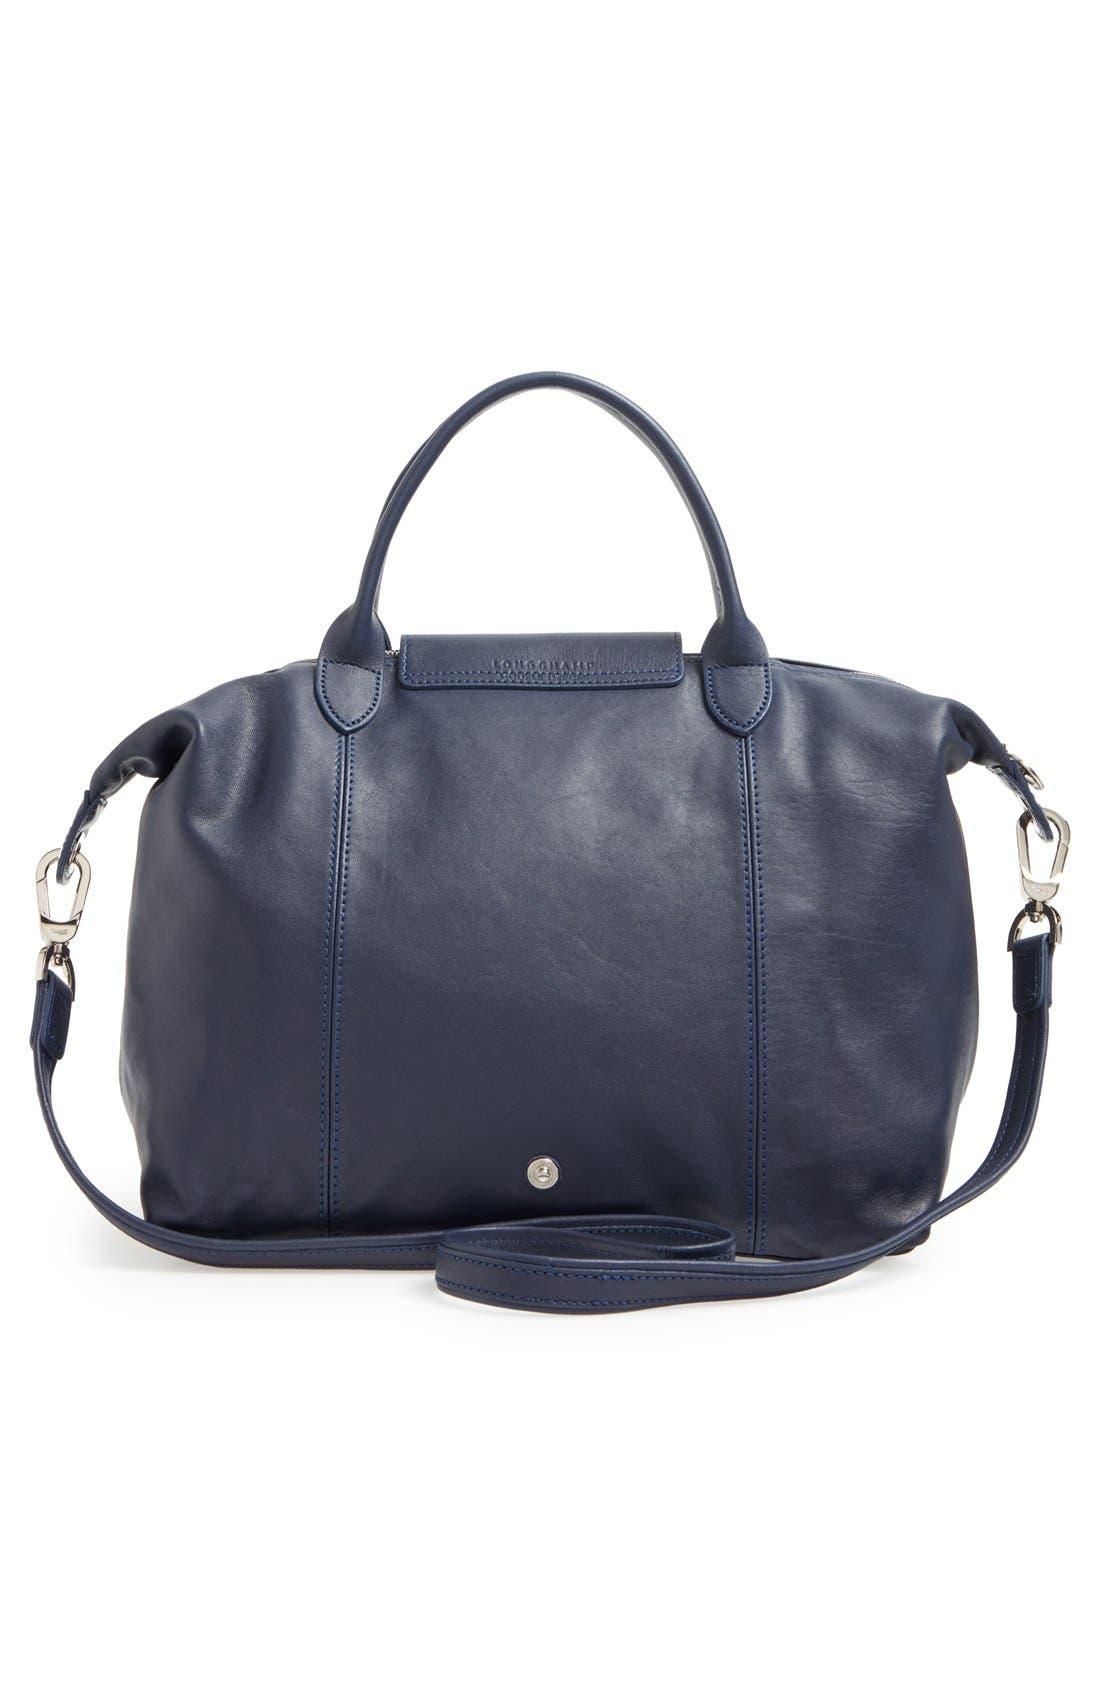 Alternate Image 3  - Longchamp 'Le Pliage Cuir' Leather Handbag